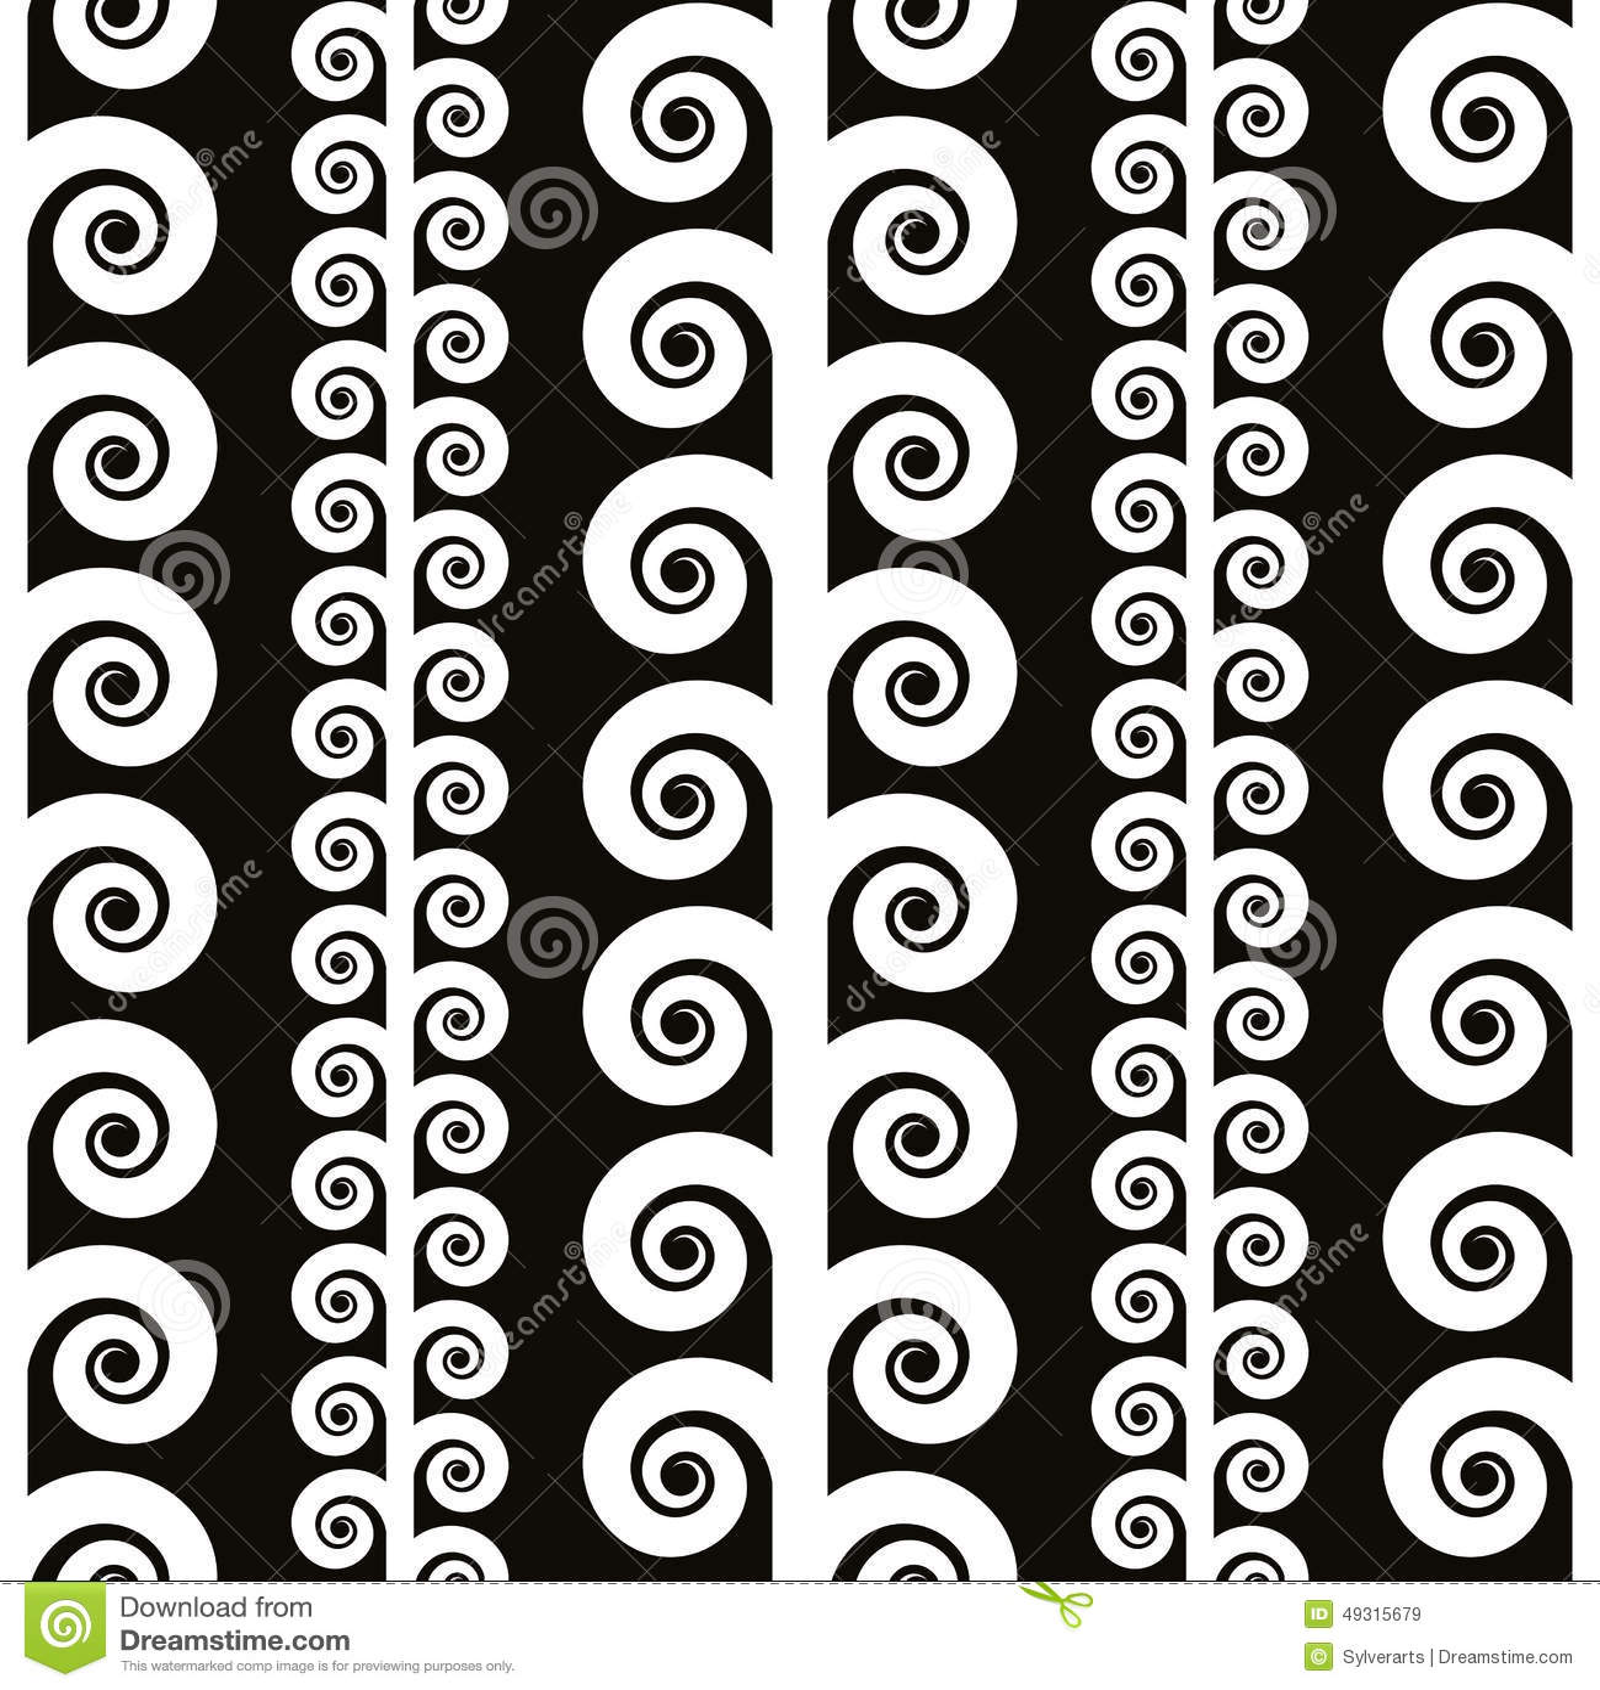 Elegant Seamless Pattern, Black And White Vector ...Black And White Elegant Backgrounds